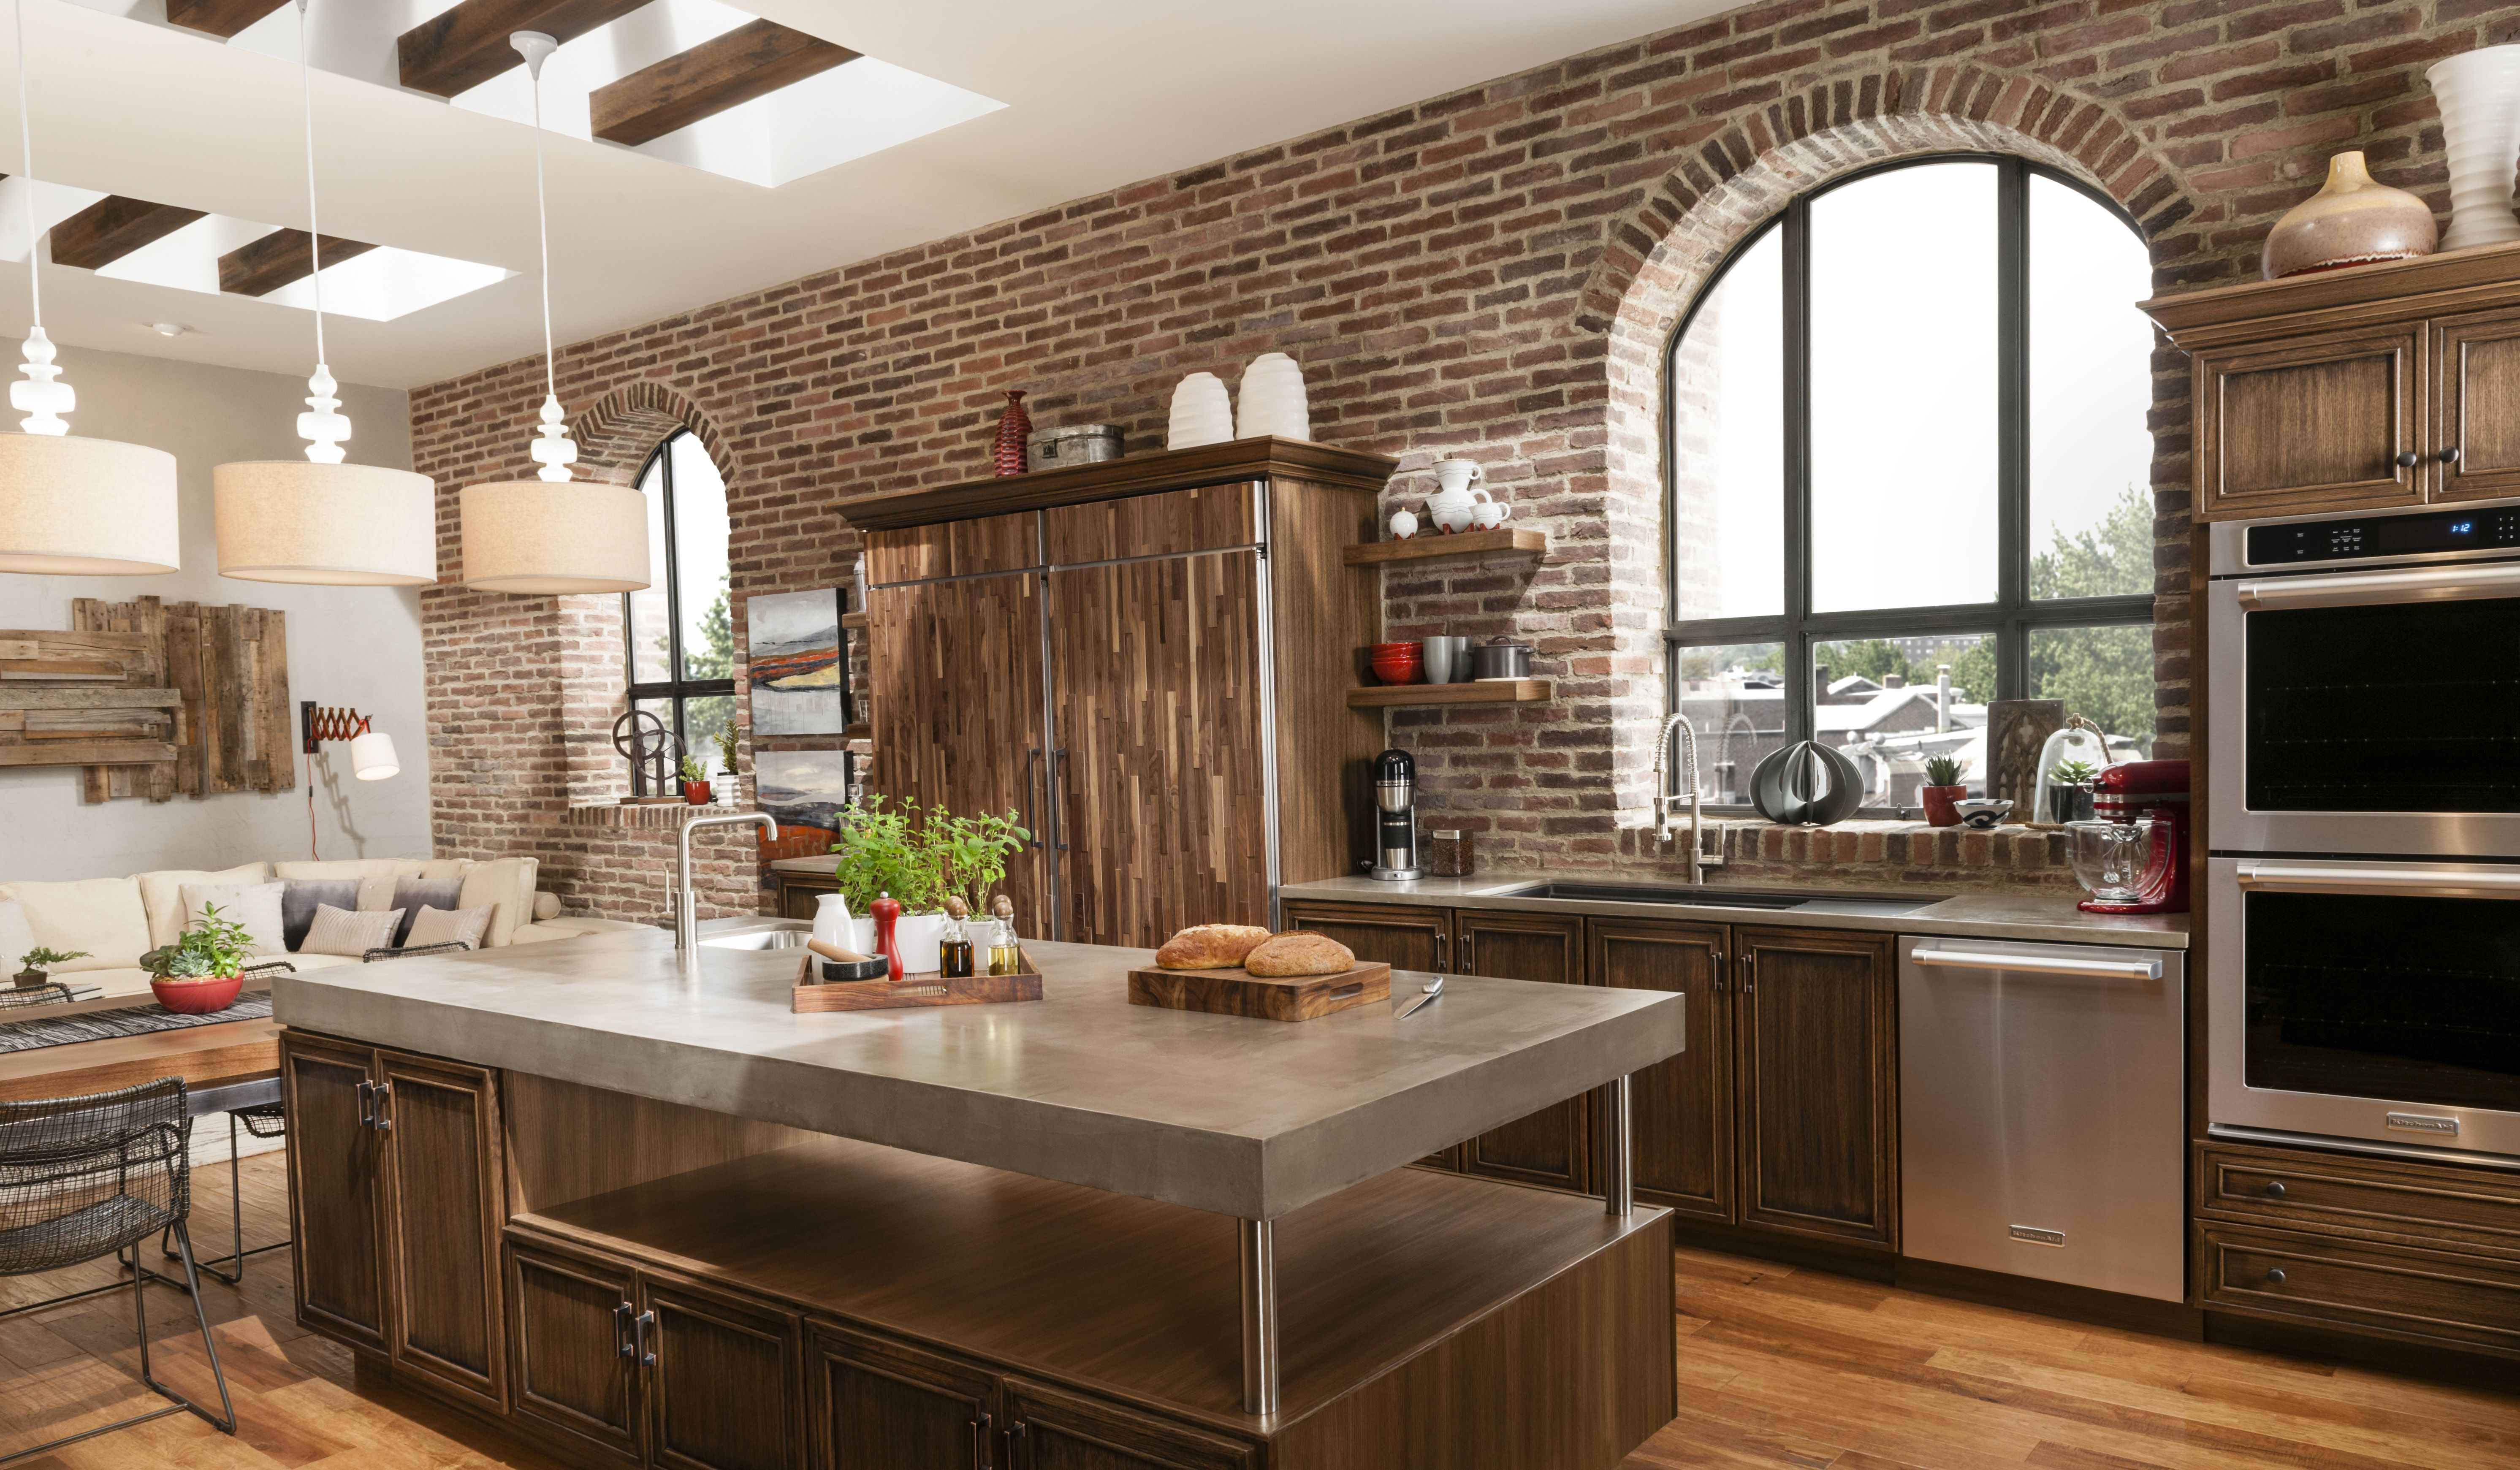 Eldorado Stone RomaBrick accent wall with a modern kitchen island